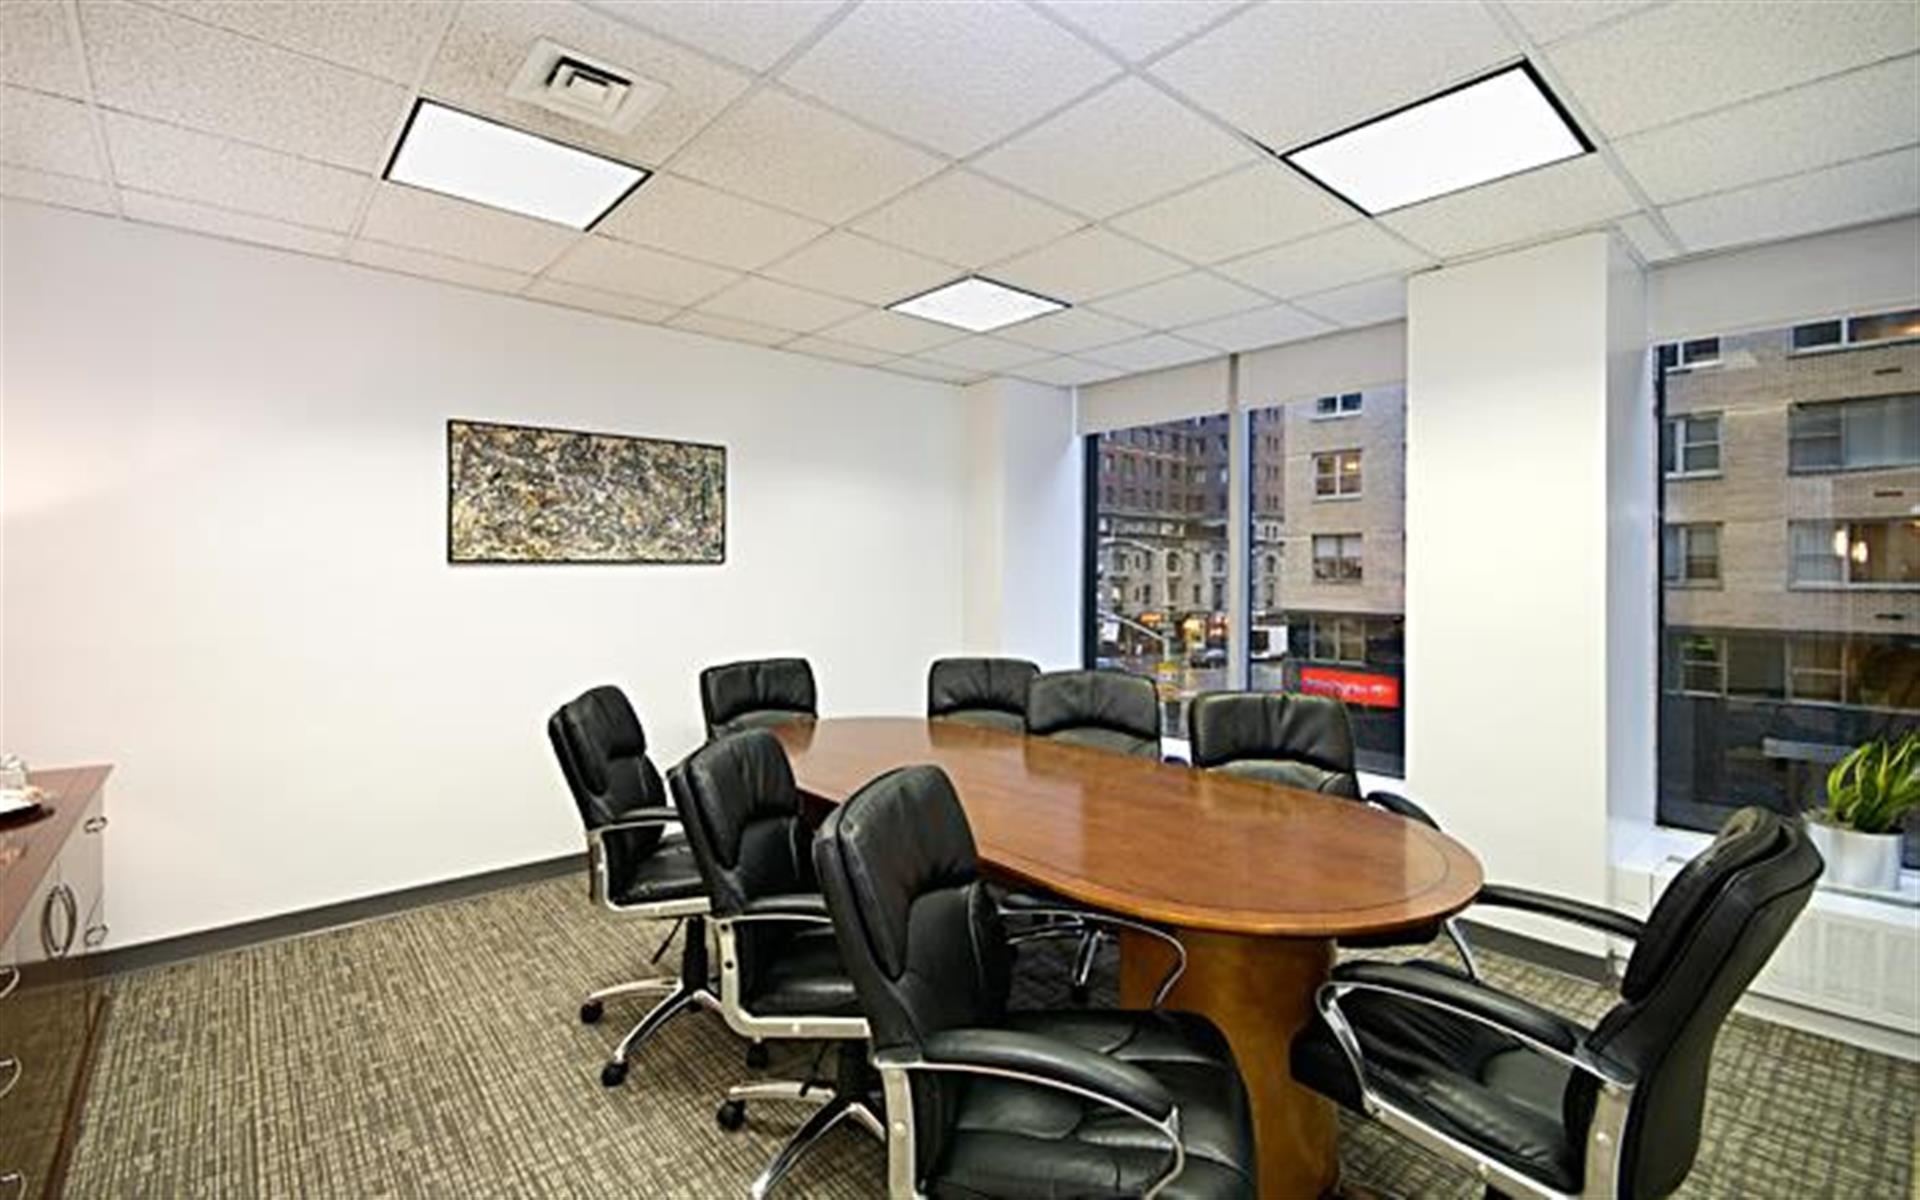 NYC Office Suites 1350 - Class A Midtown Windowed / St. Regis